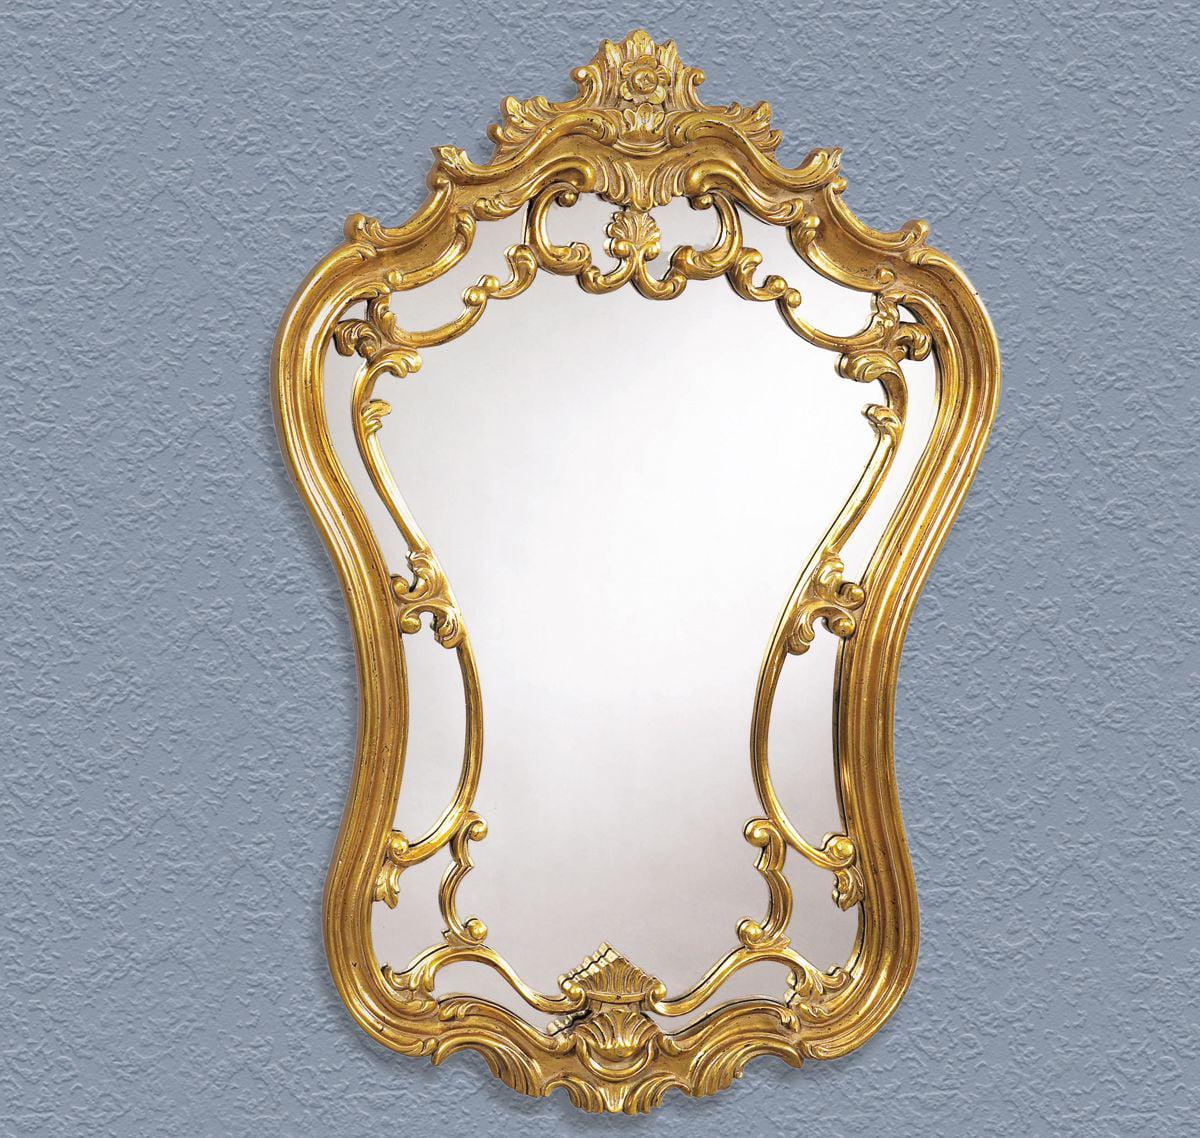 Bassett Old World Hermosa Wall Mirror in Gold Leaf